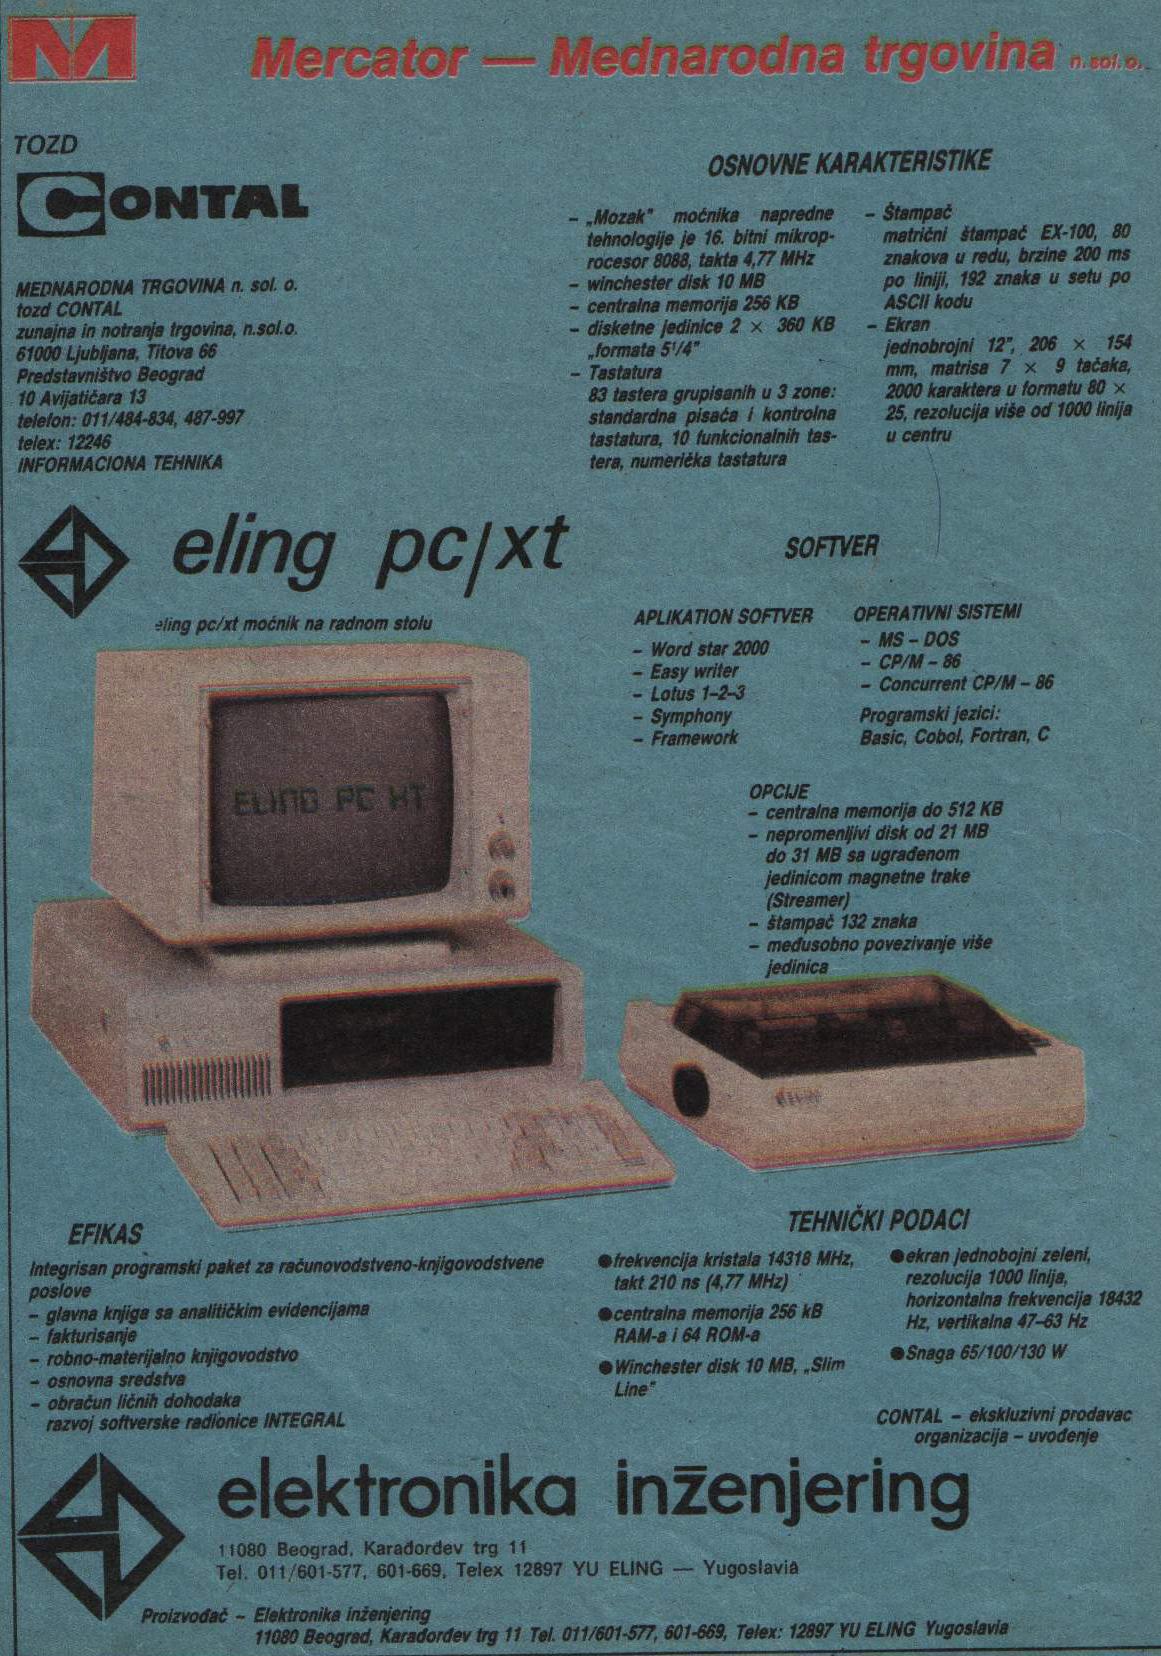 ELING PC XT